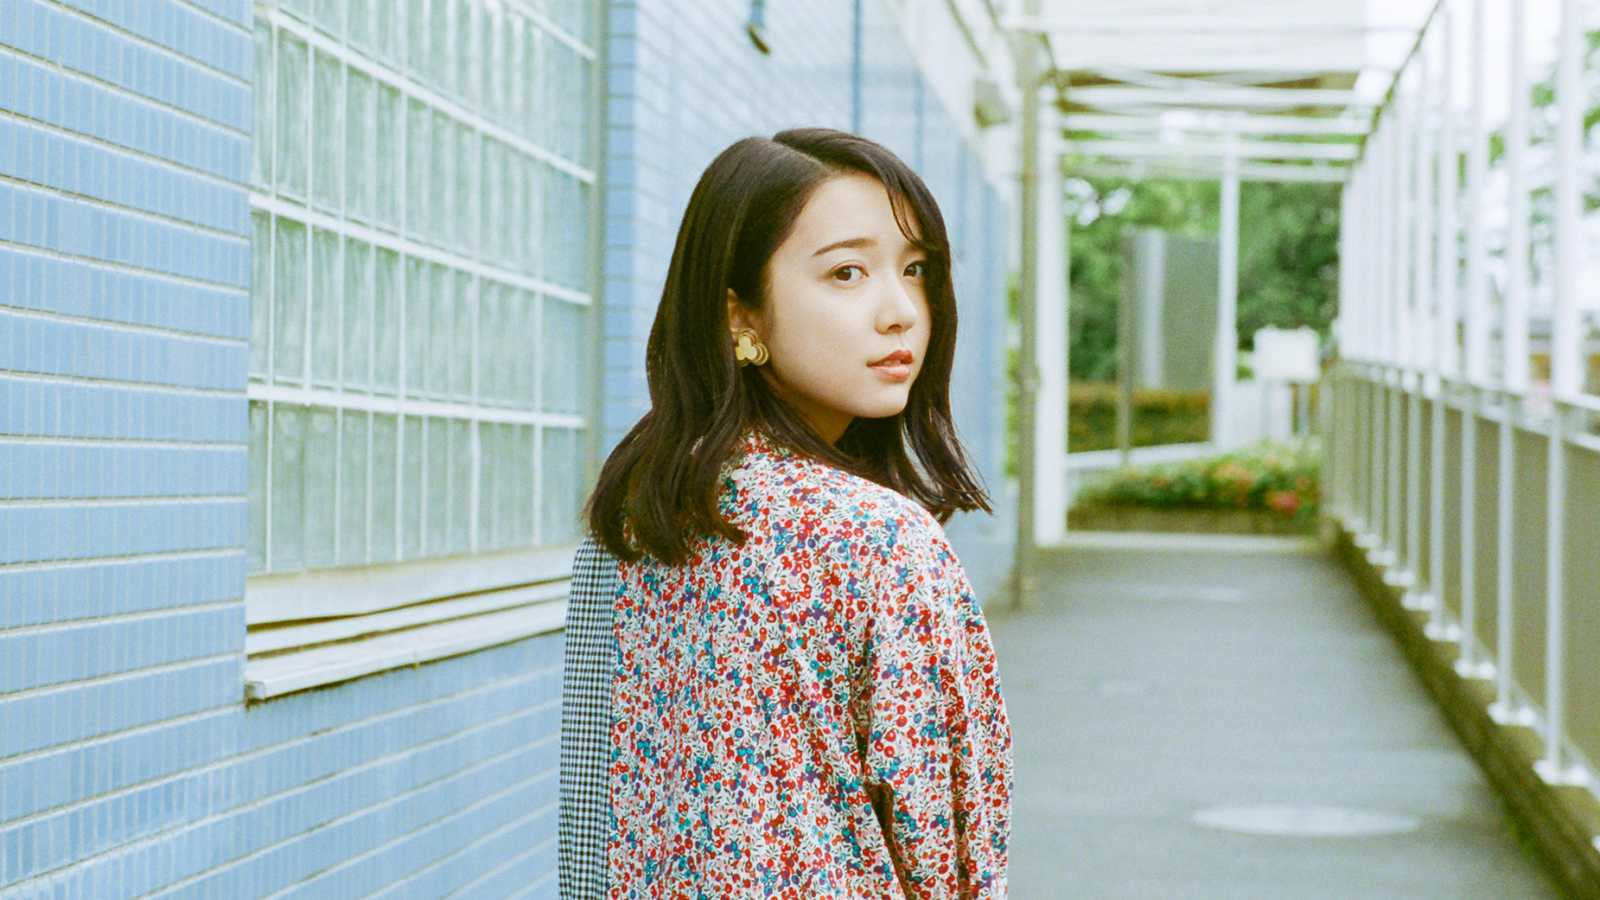 First Album from Mone Kamishiraishi © TOHO ENTERTAINMENT CO., LTD. / UNIVERSAL MUSIC LLC. All rights reserved.